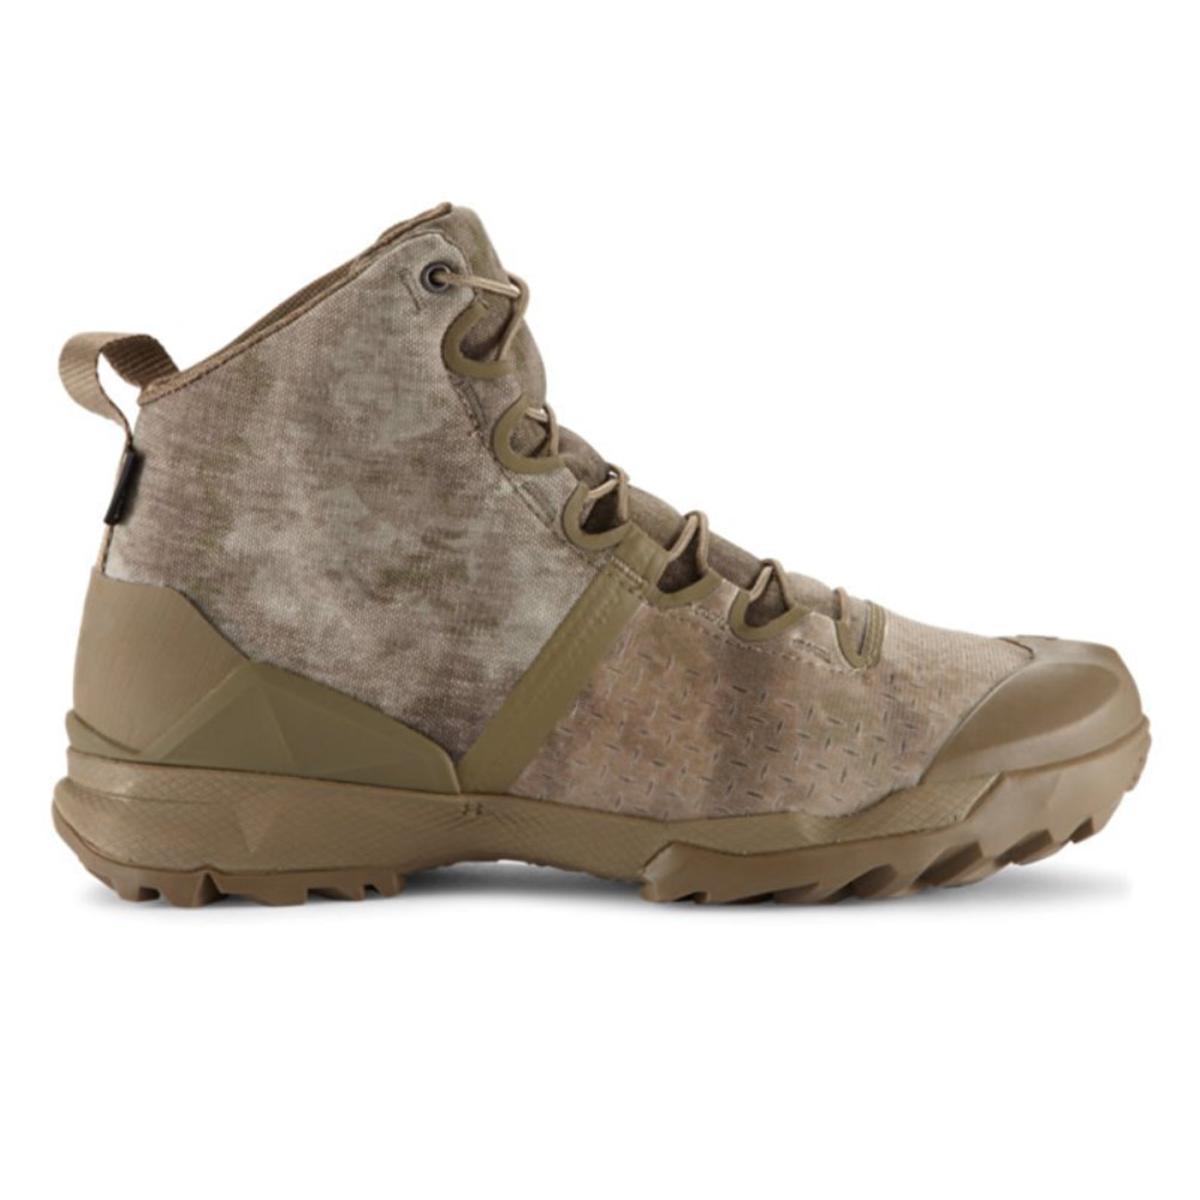 Under Armour 1261918 Ua Infil Gtx Tactical Boot Waterproof